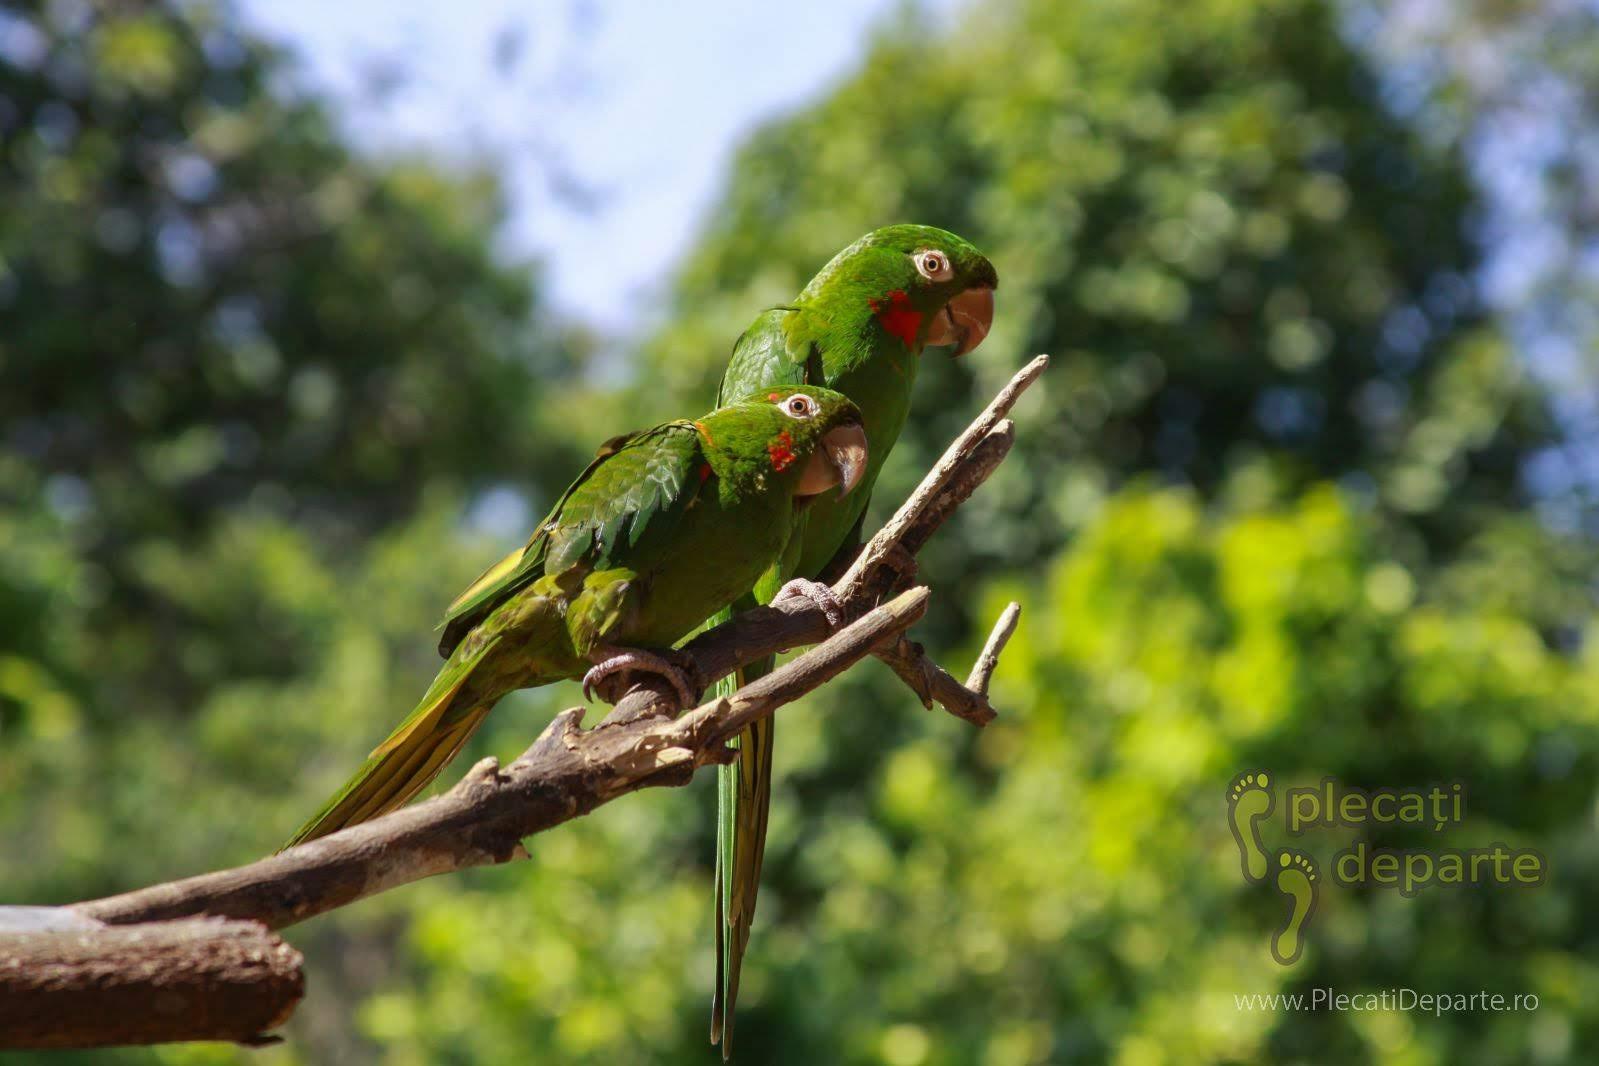 Papagali verzi, Orquideario Amazonico, Tarapoto, Peru. Green parrots at Orquideario Amazonico, Tarapoto, Peru